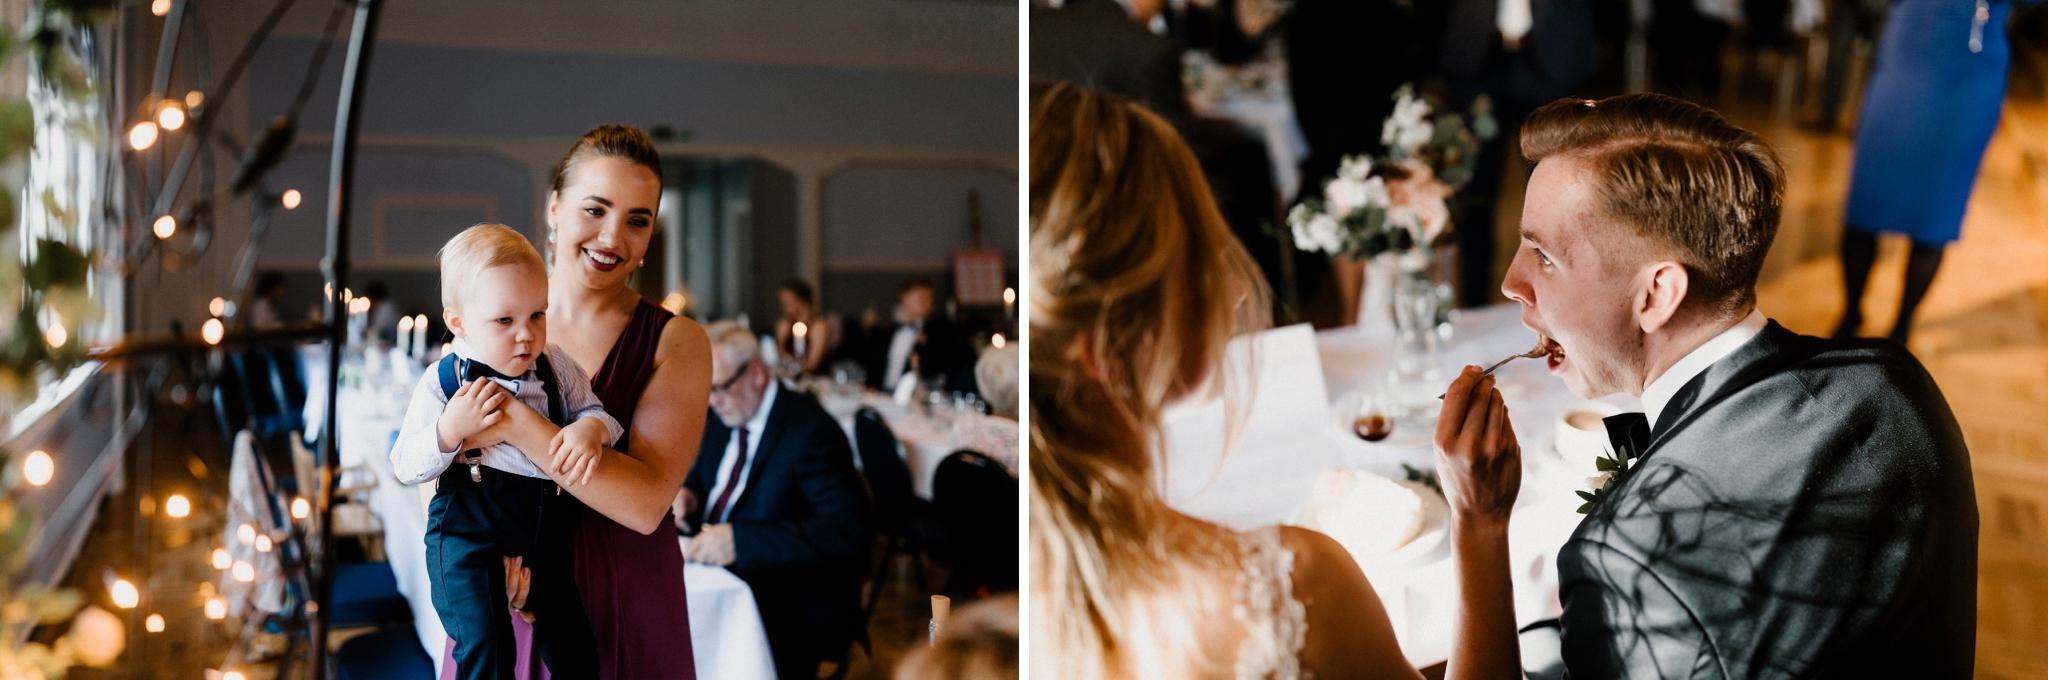 Johanna + Mikko - Tampere - Photo by Patrick Karkkolainen Wedding Photographer-108.jpg